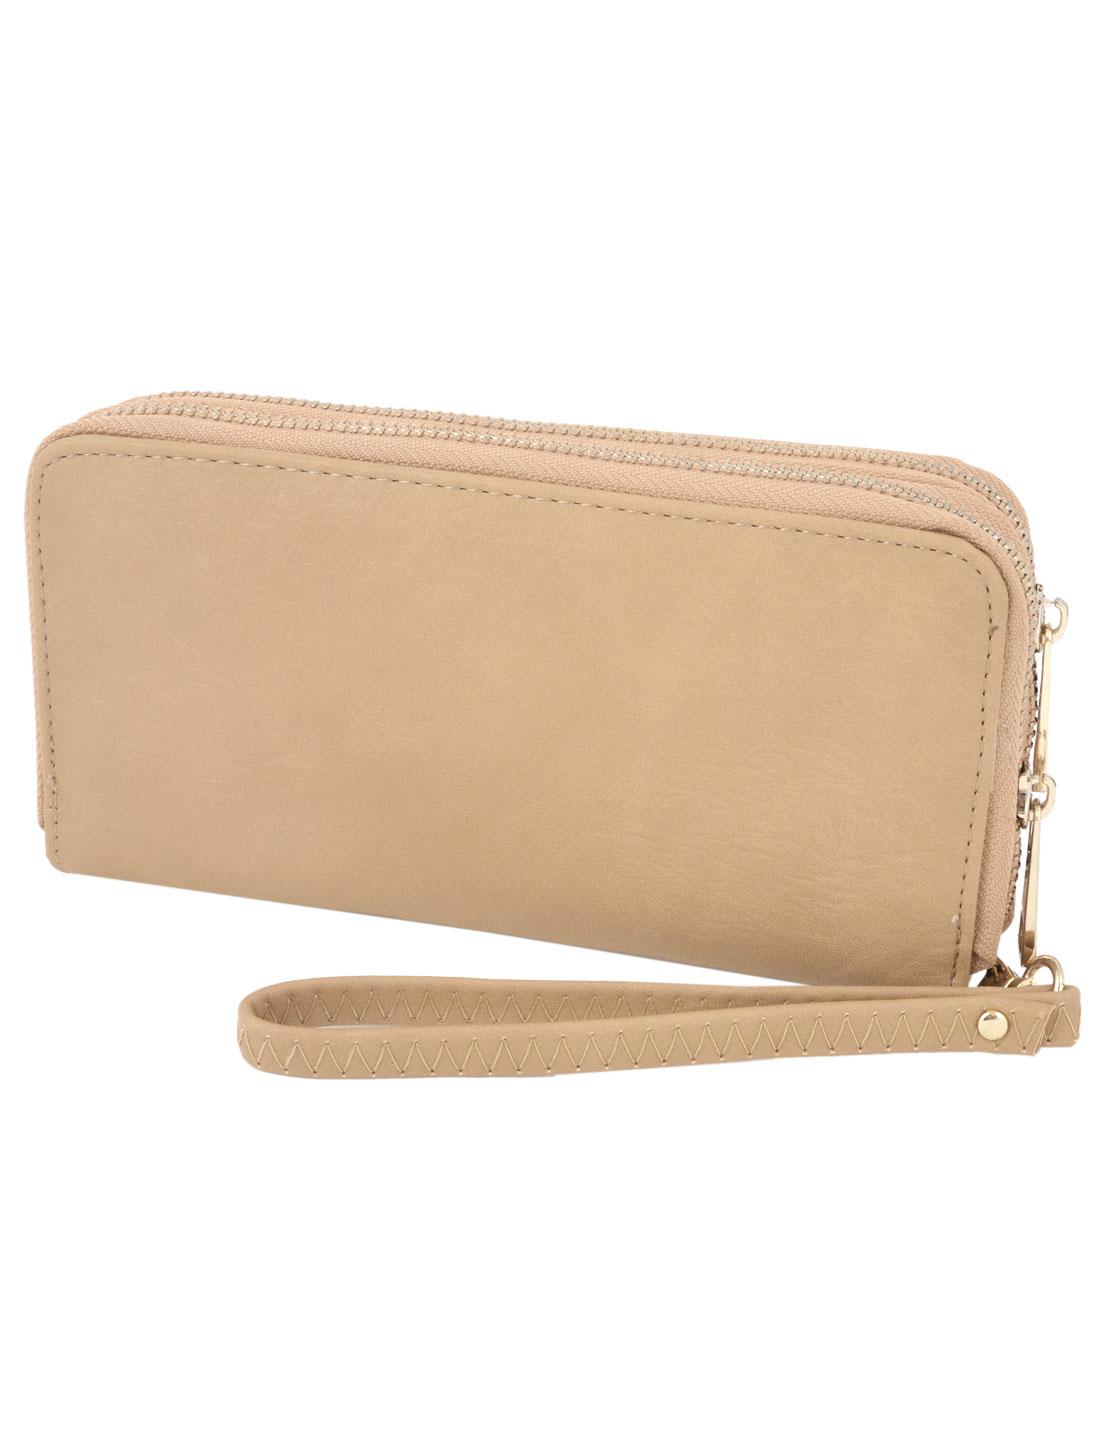 Ladies Zipper Closure Faux Leather 6 Compartments Khaki Money Change Bank Cards Wallet Holder w Wrist Strap